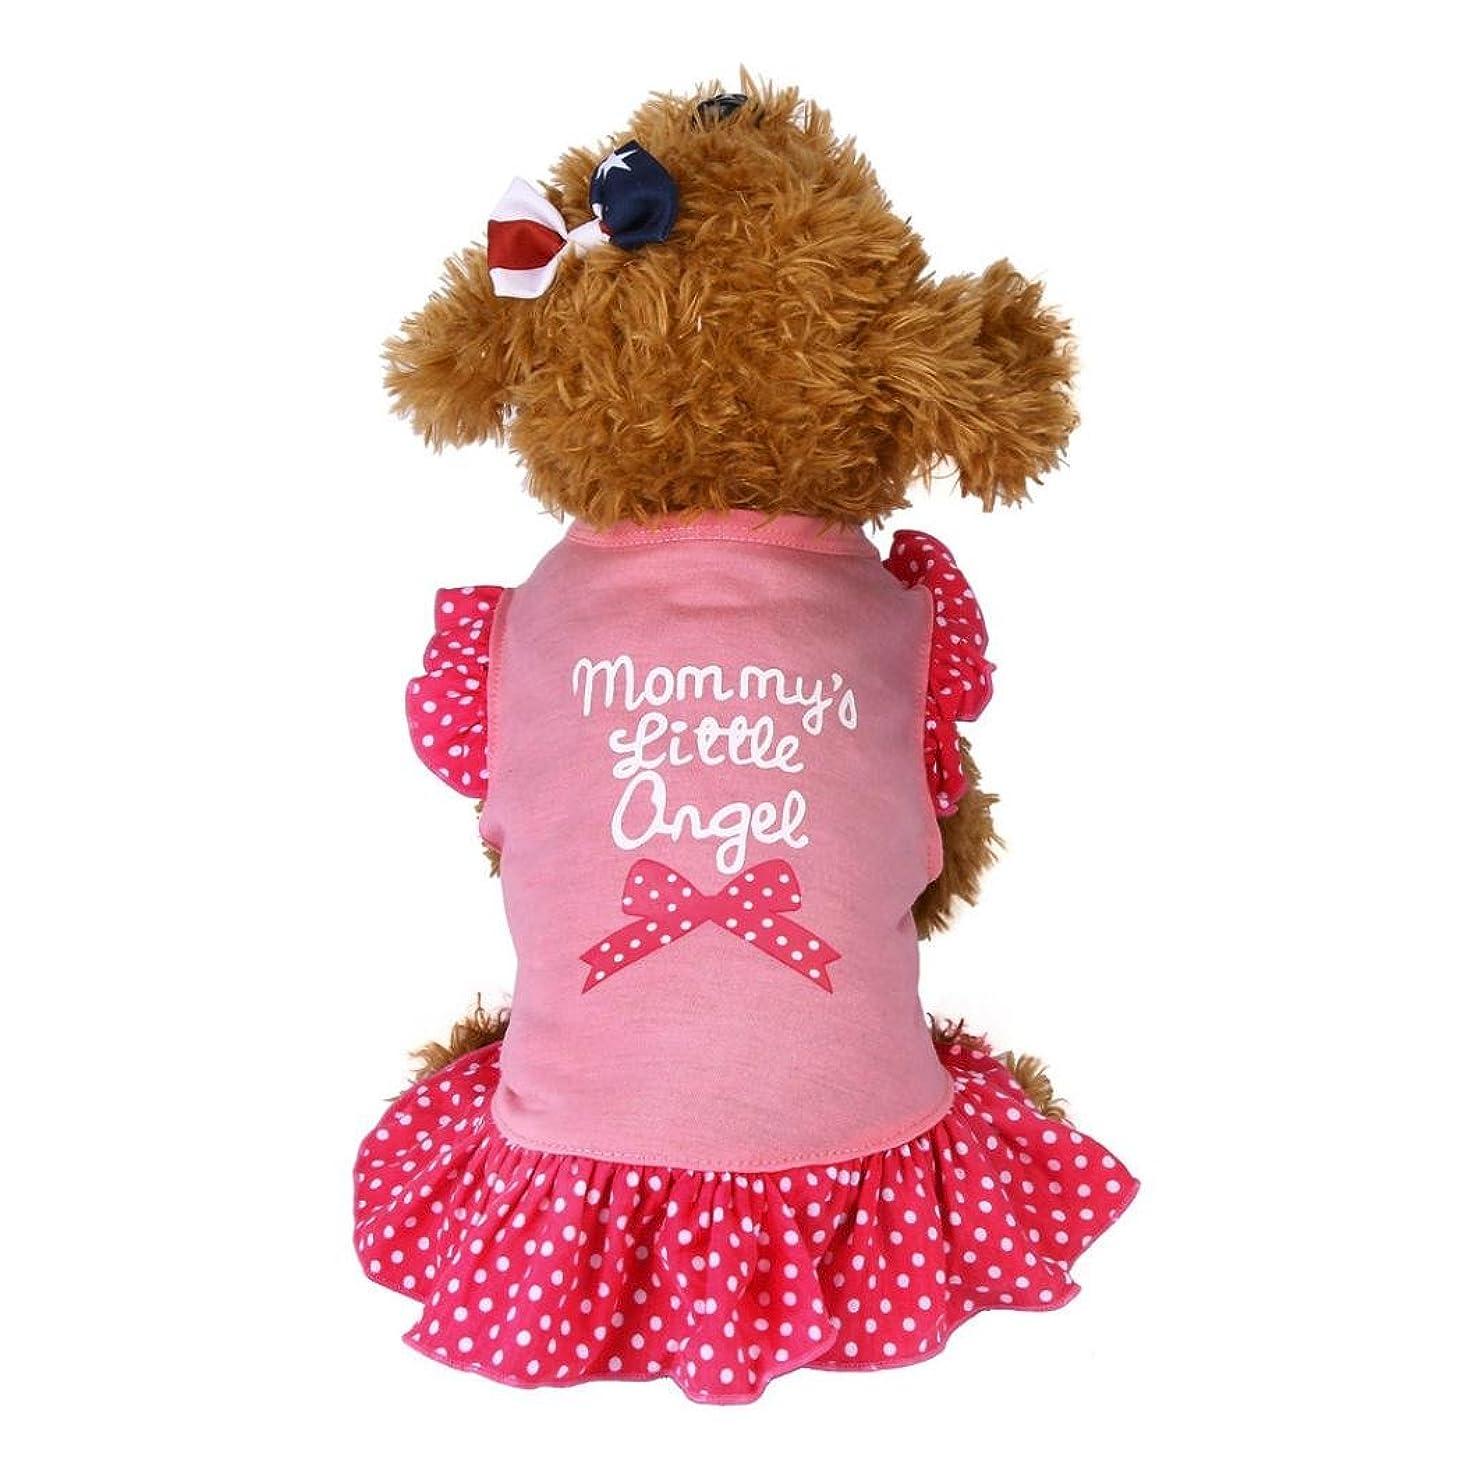 Howstar Pet Dress, Summer Cute Pet Puppy Small Dog Cat Mommy Little Love Print Apparel Clothes Fly Sleeve Dress